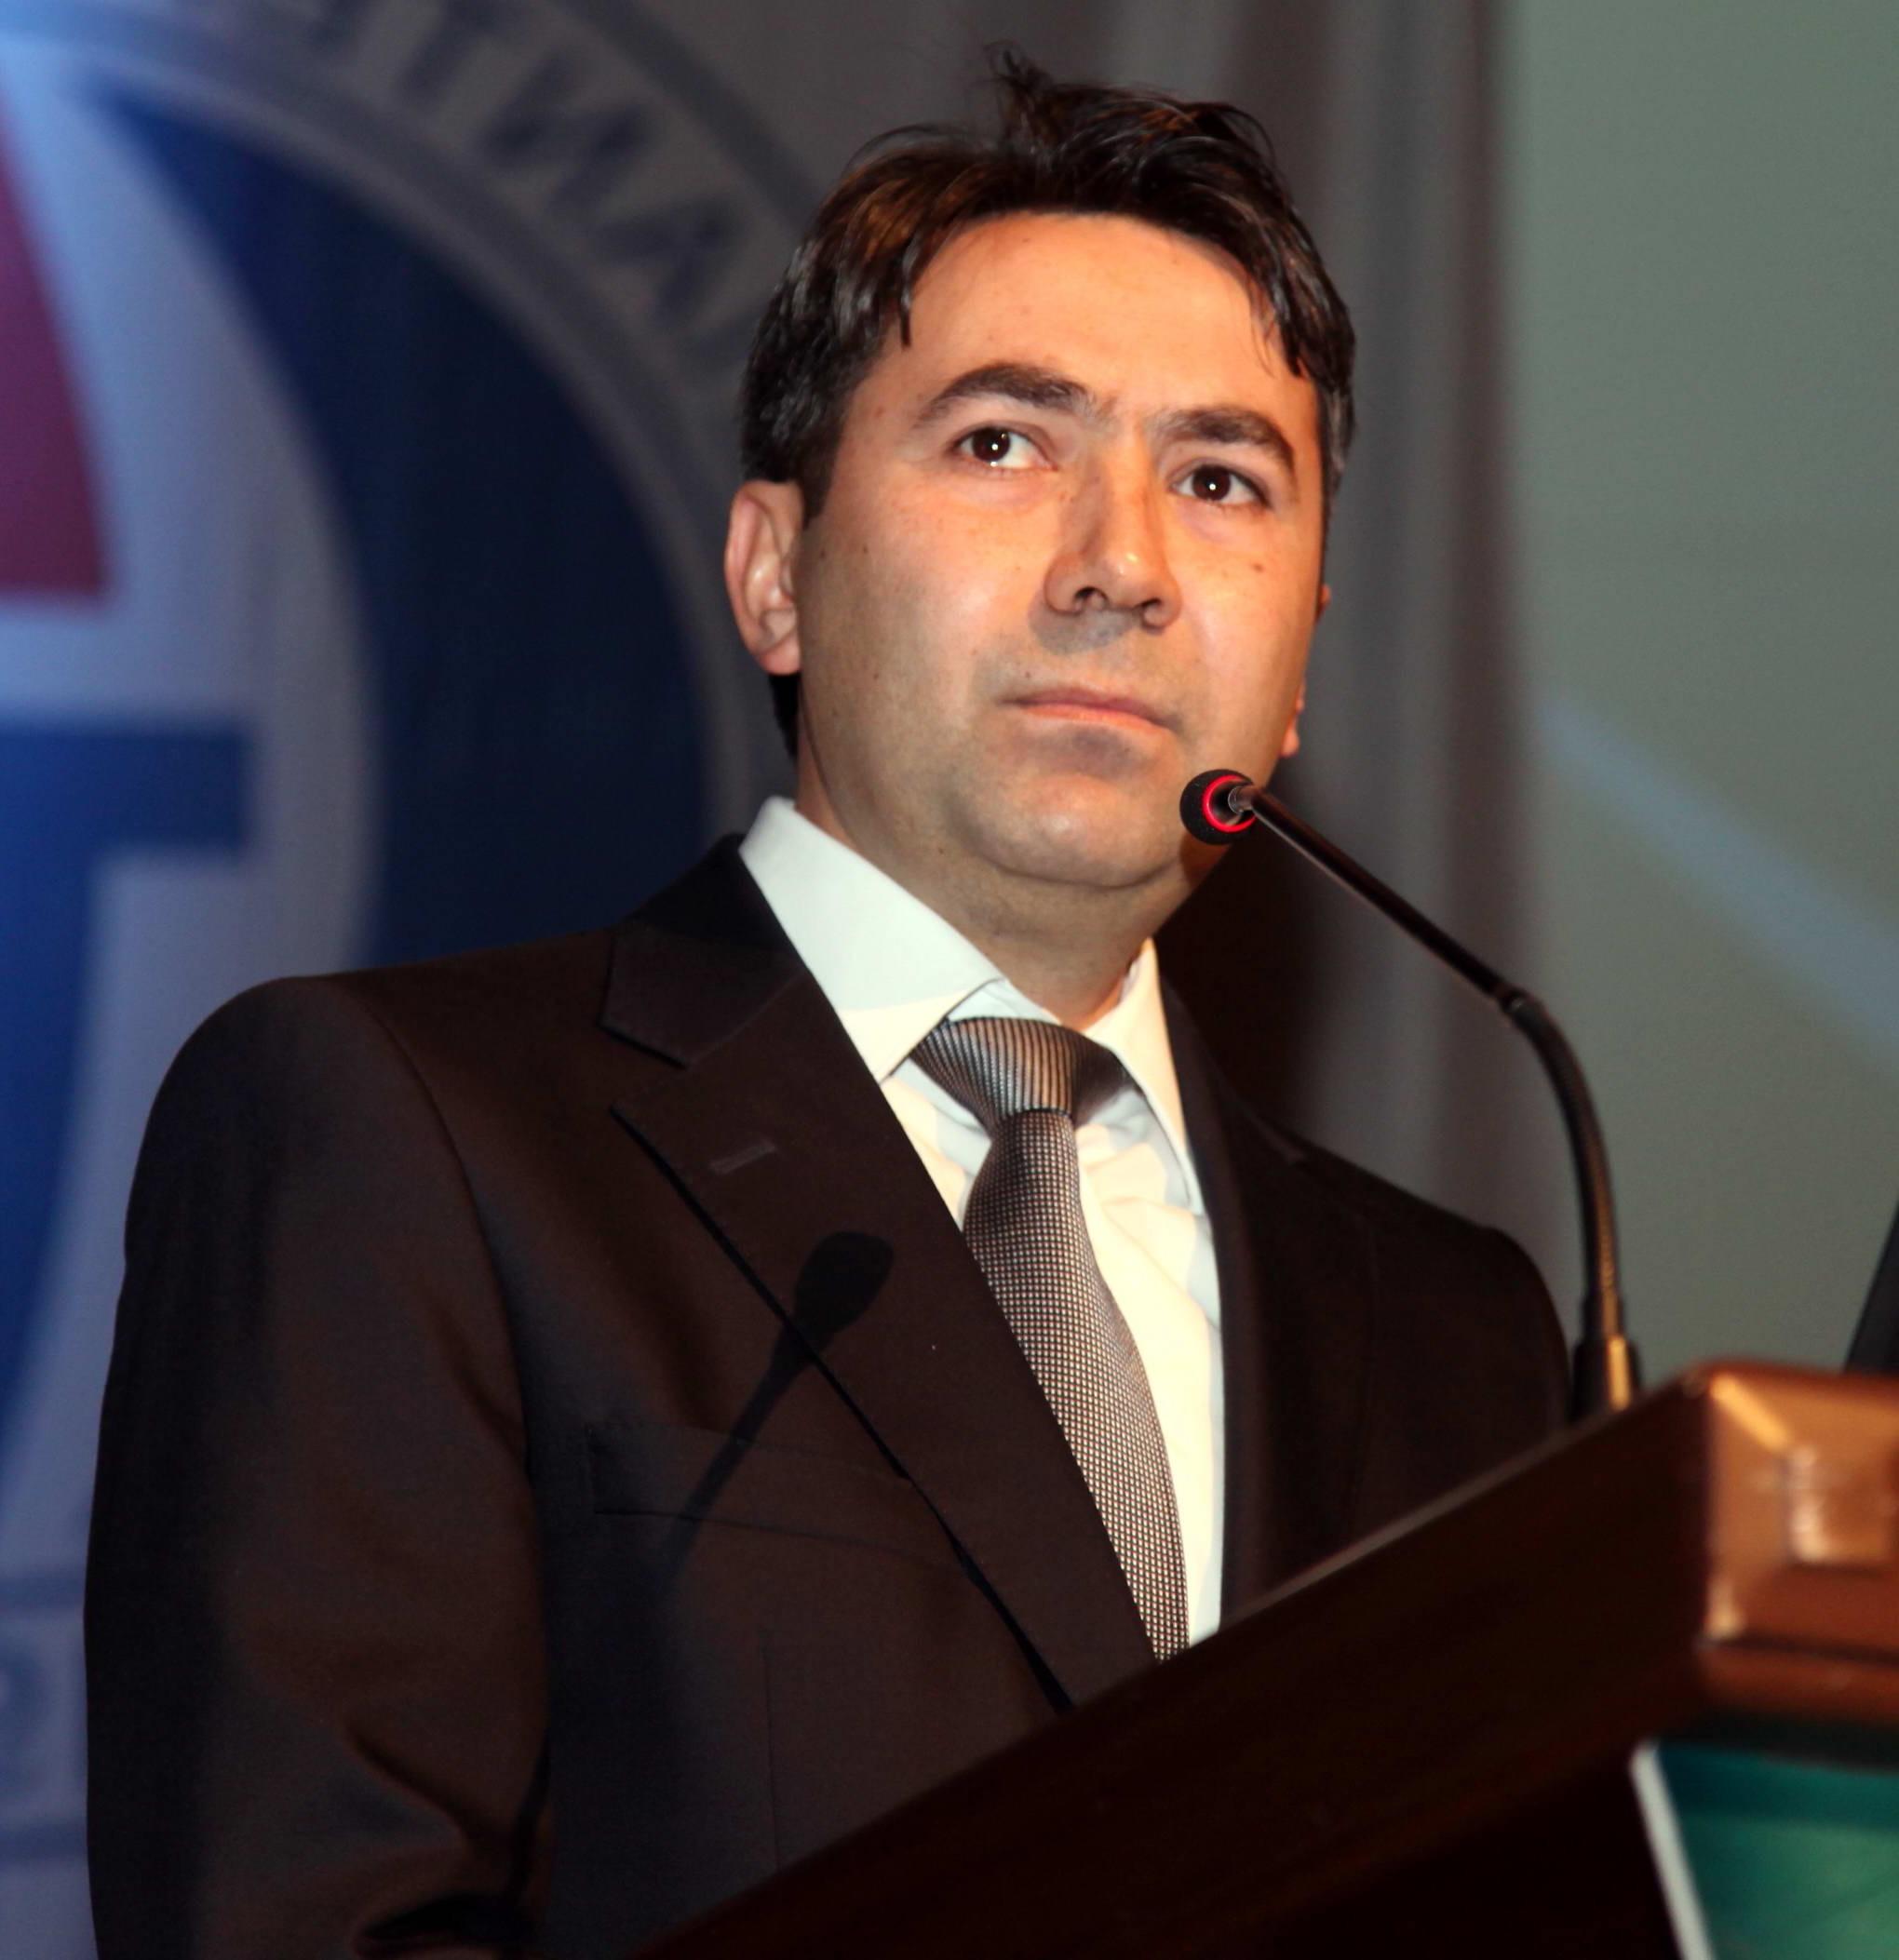 501-Tıp_Kongresi - Doç. Dr. Sacit Çoban